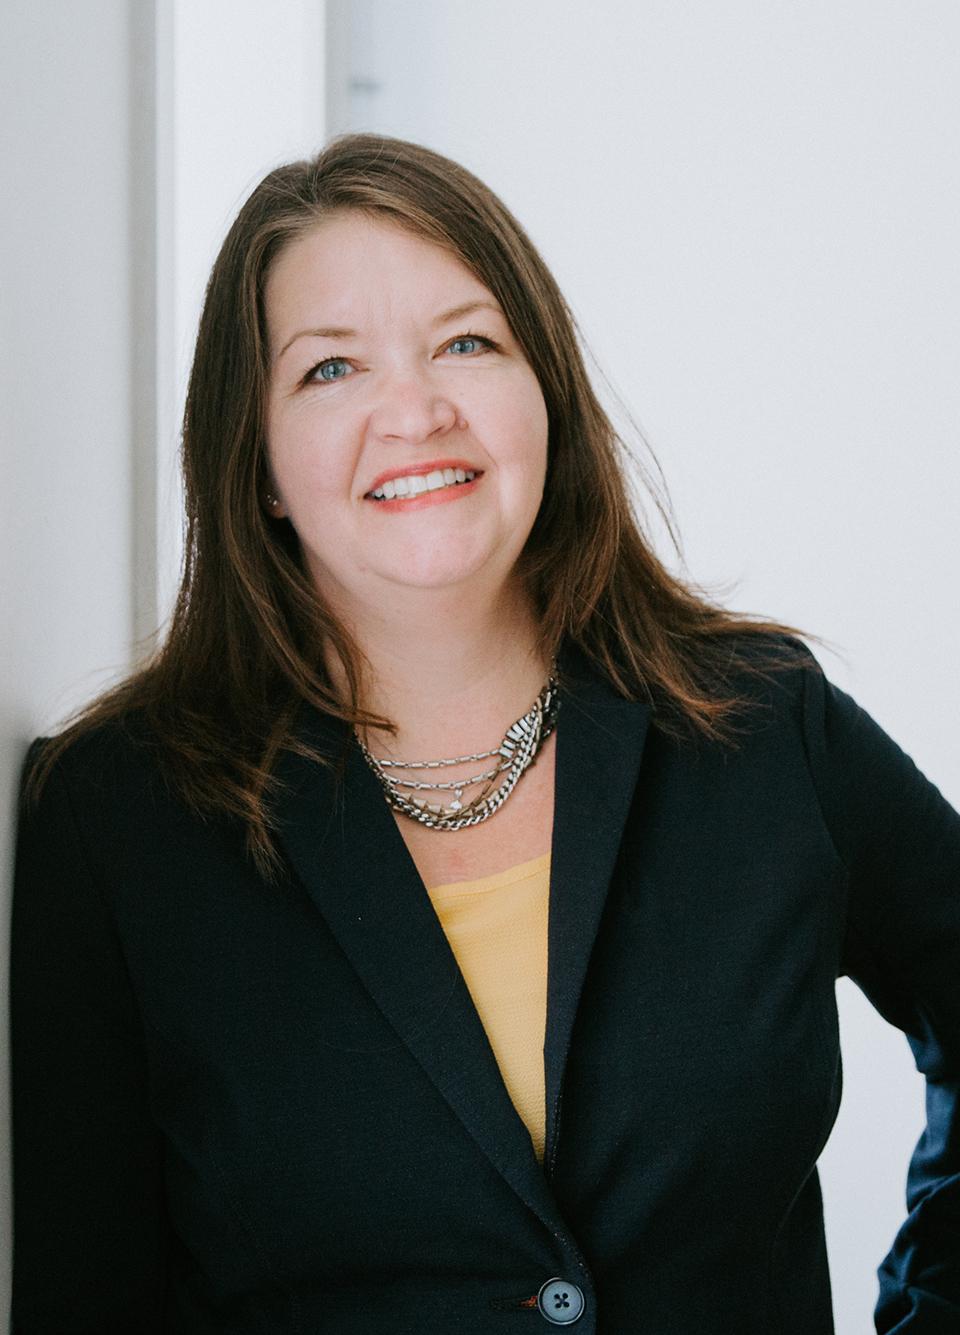 Westoba Mobile Mortgage Specialist, Karla Robertson